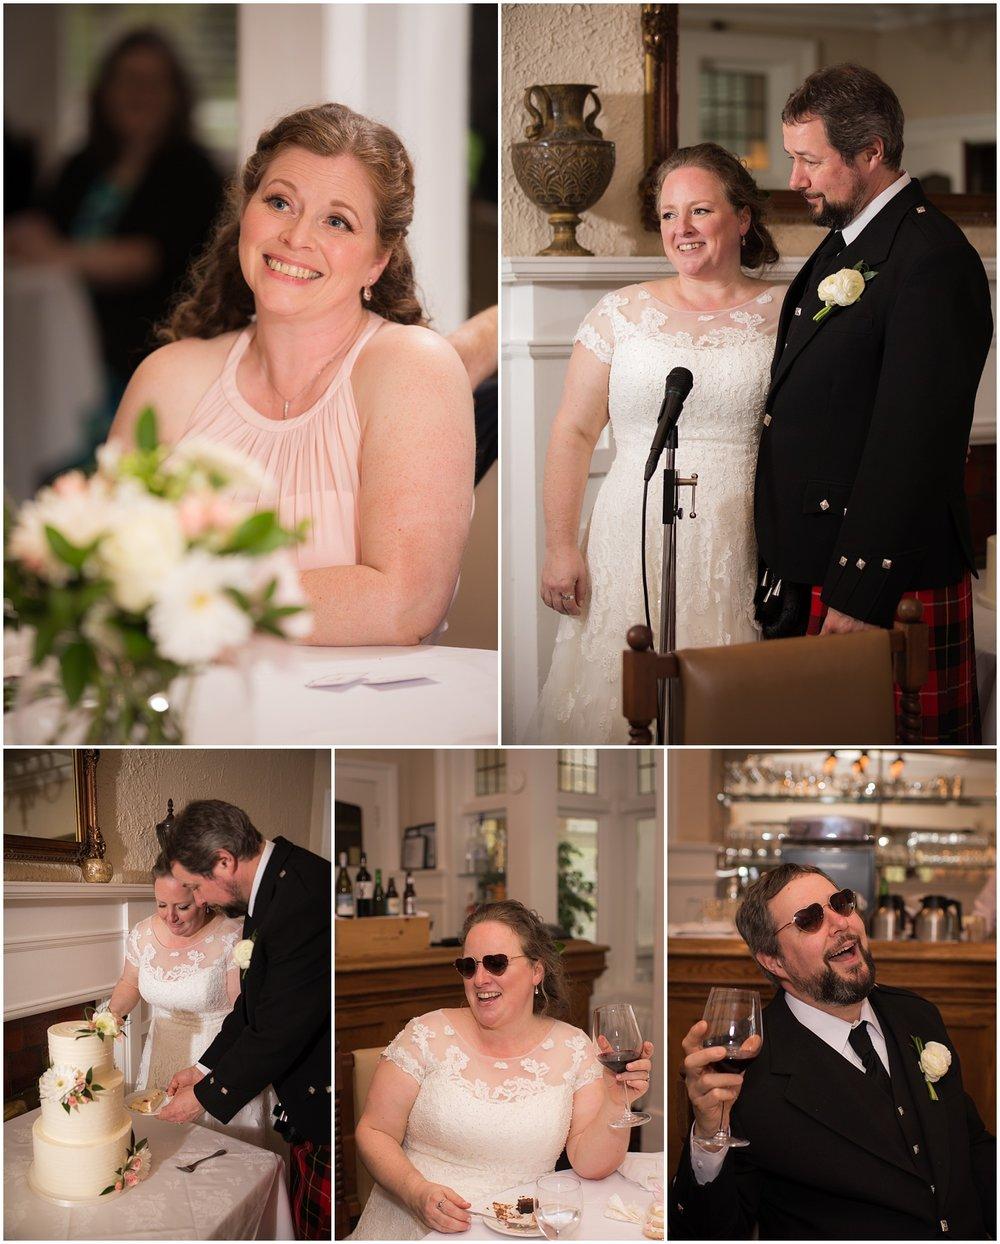 Amazing Day Photography - Hart House Wedding - Deer Lake Park Wedding - Burnaby Wedding Photographer (15).jpg